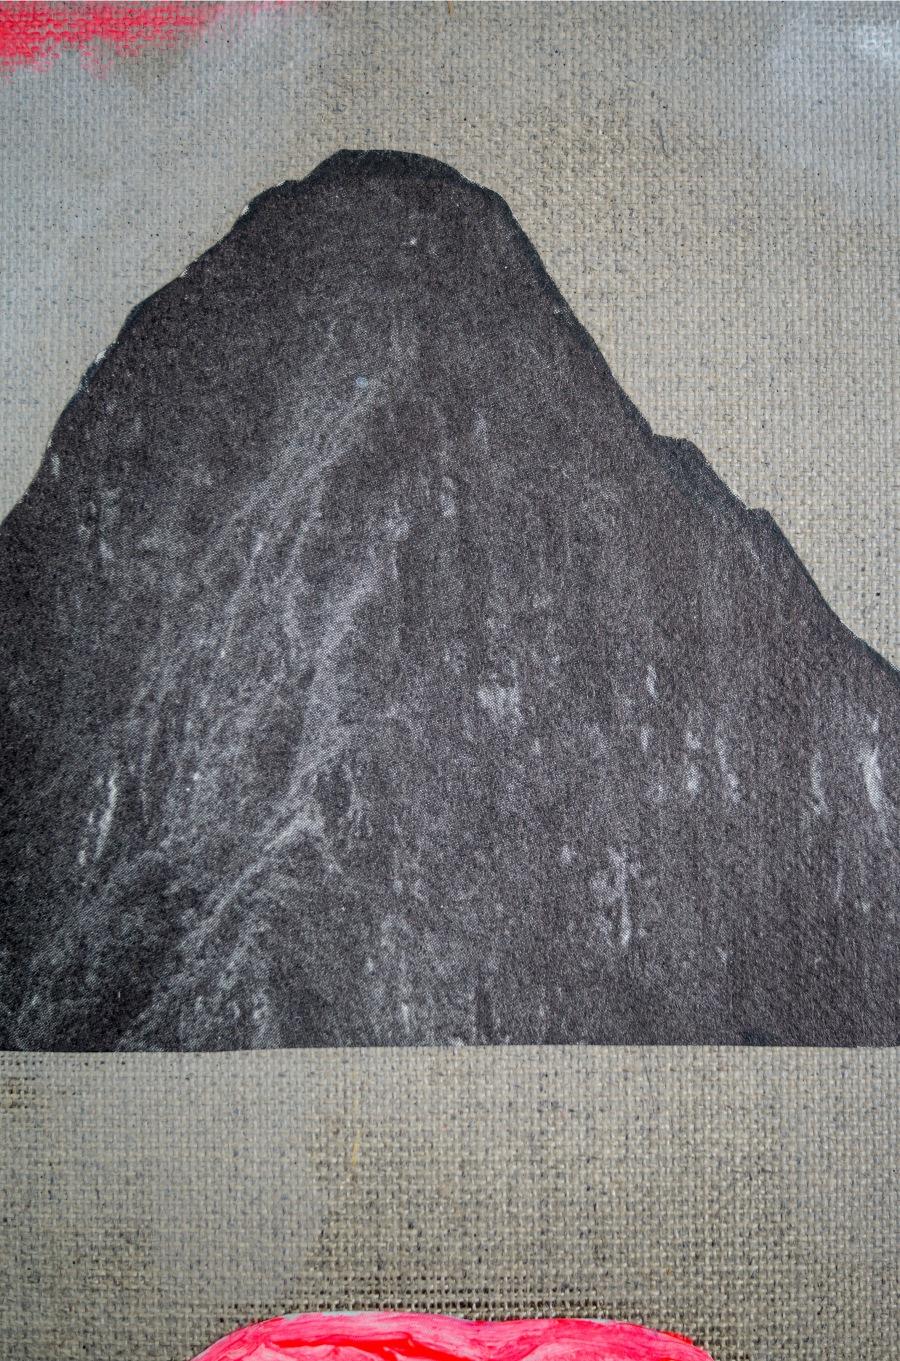 Secret Mountain | An imaginary hike (2 of 27)